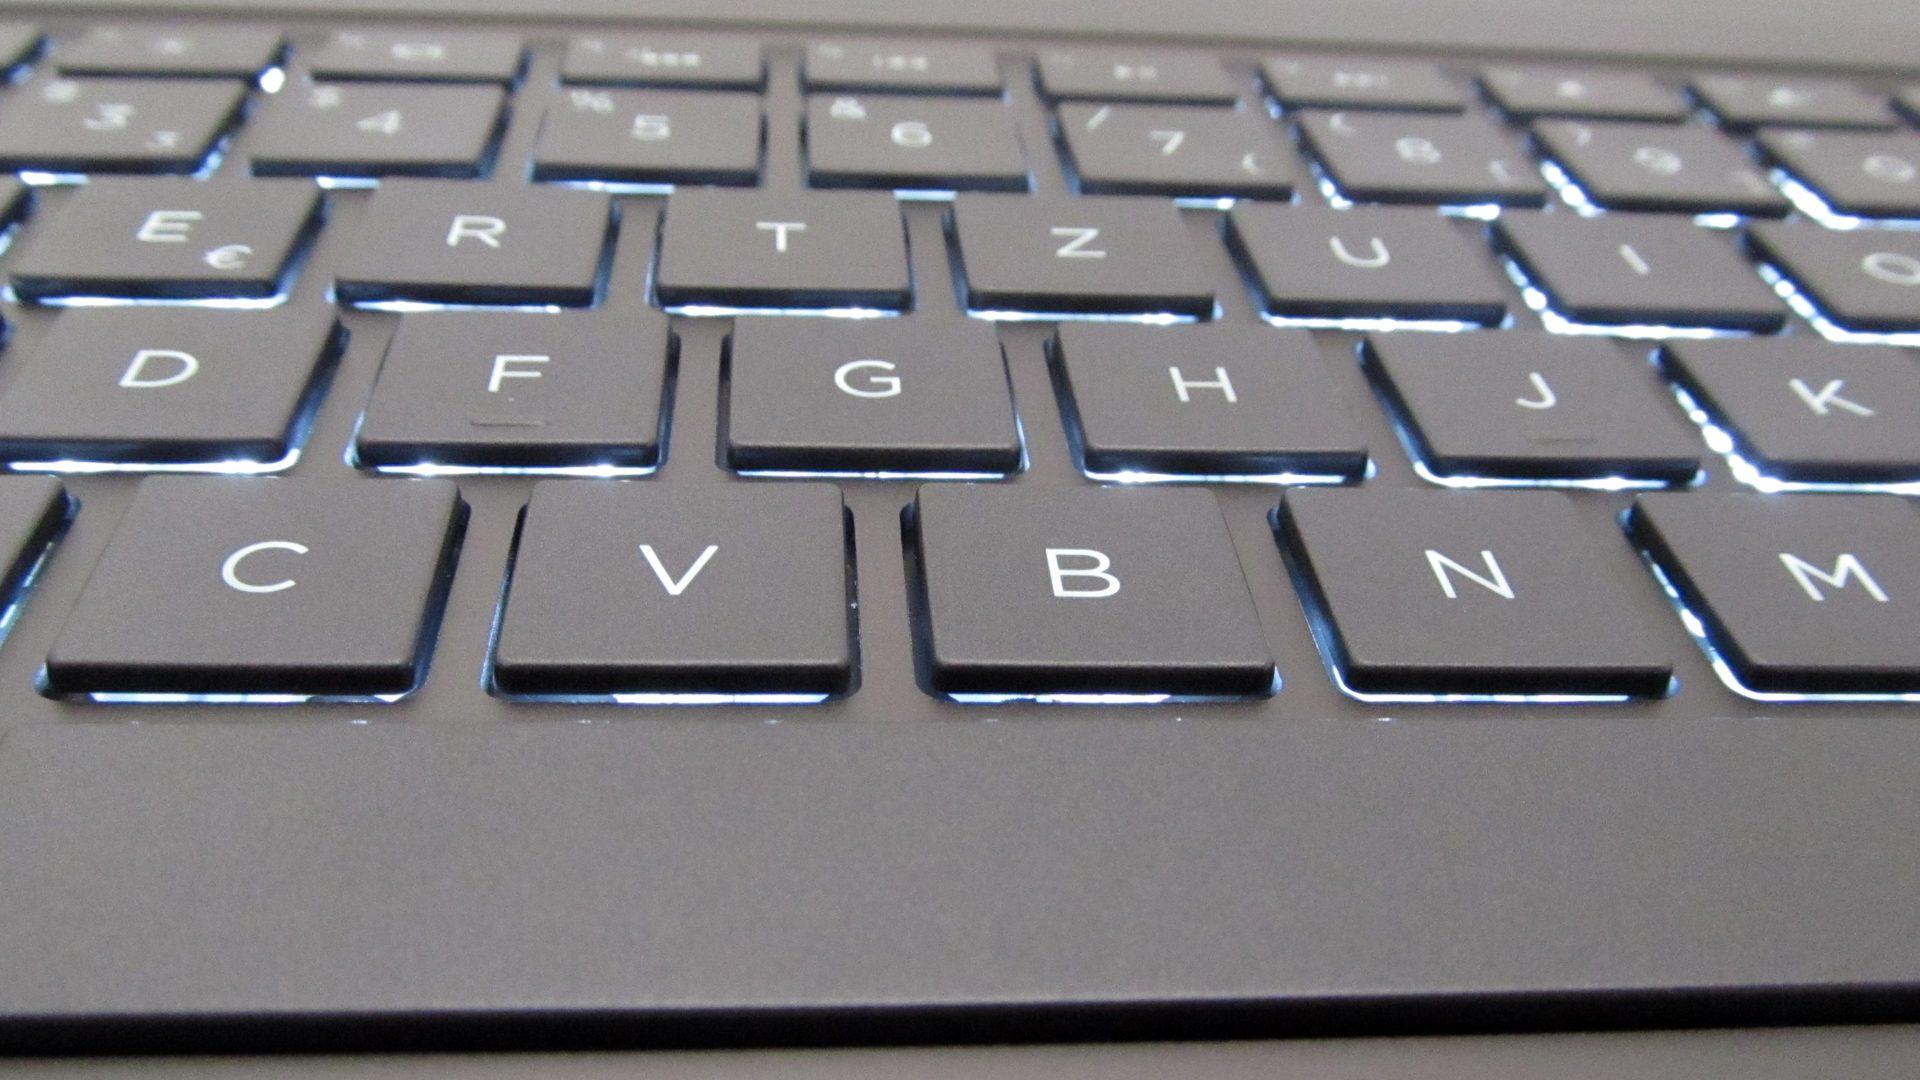 HP_Spectre_OLED-Tastatur_3